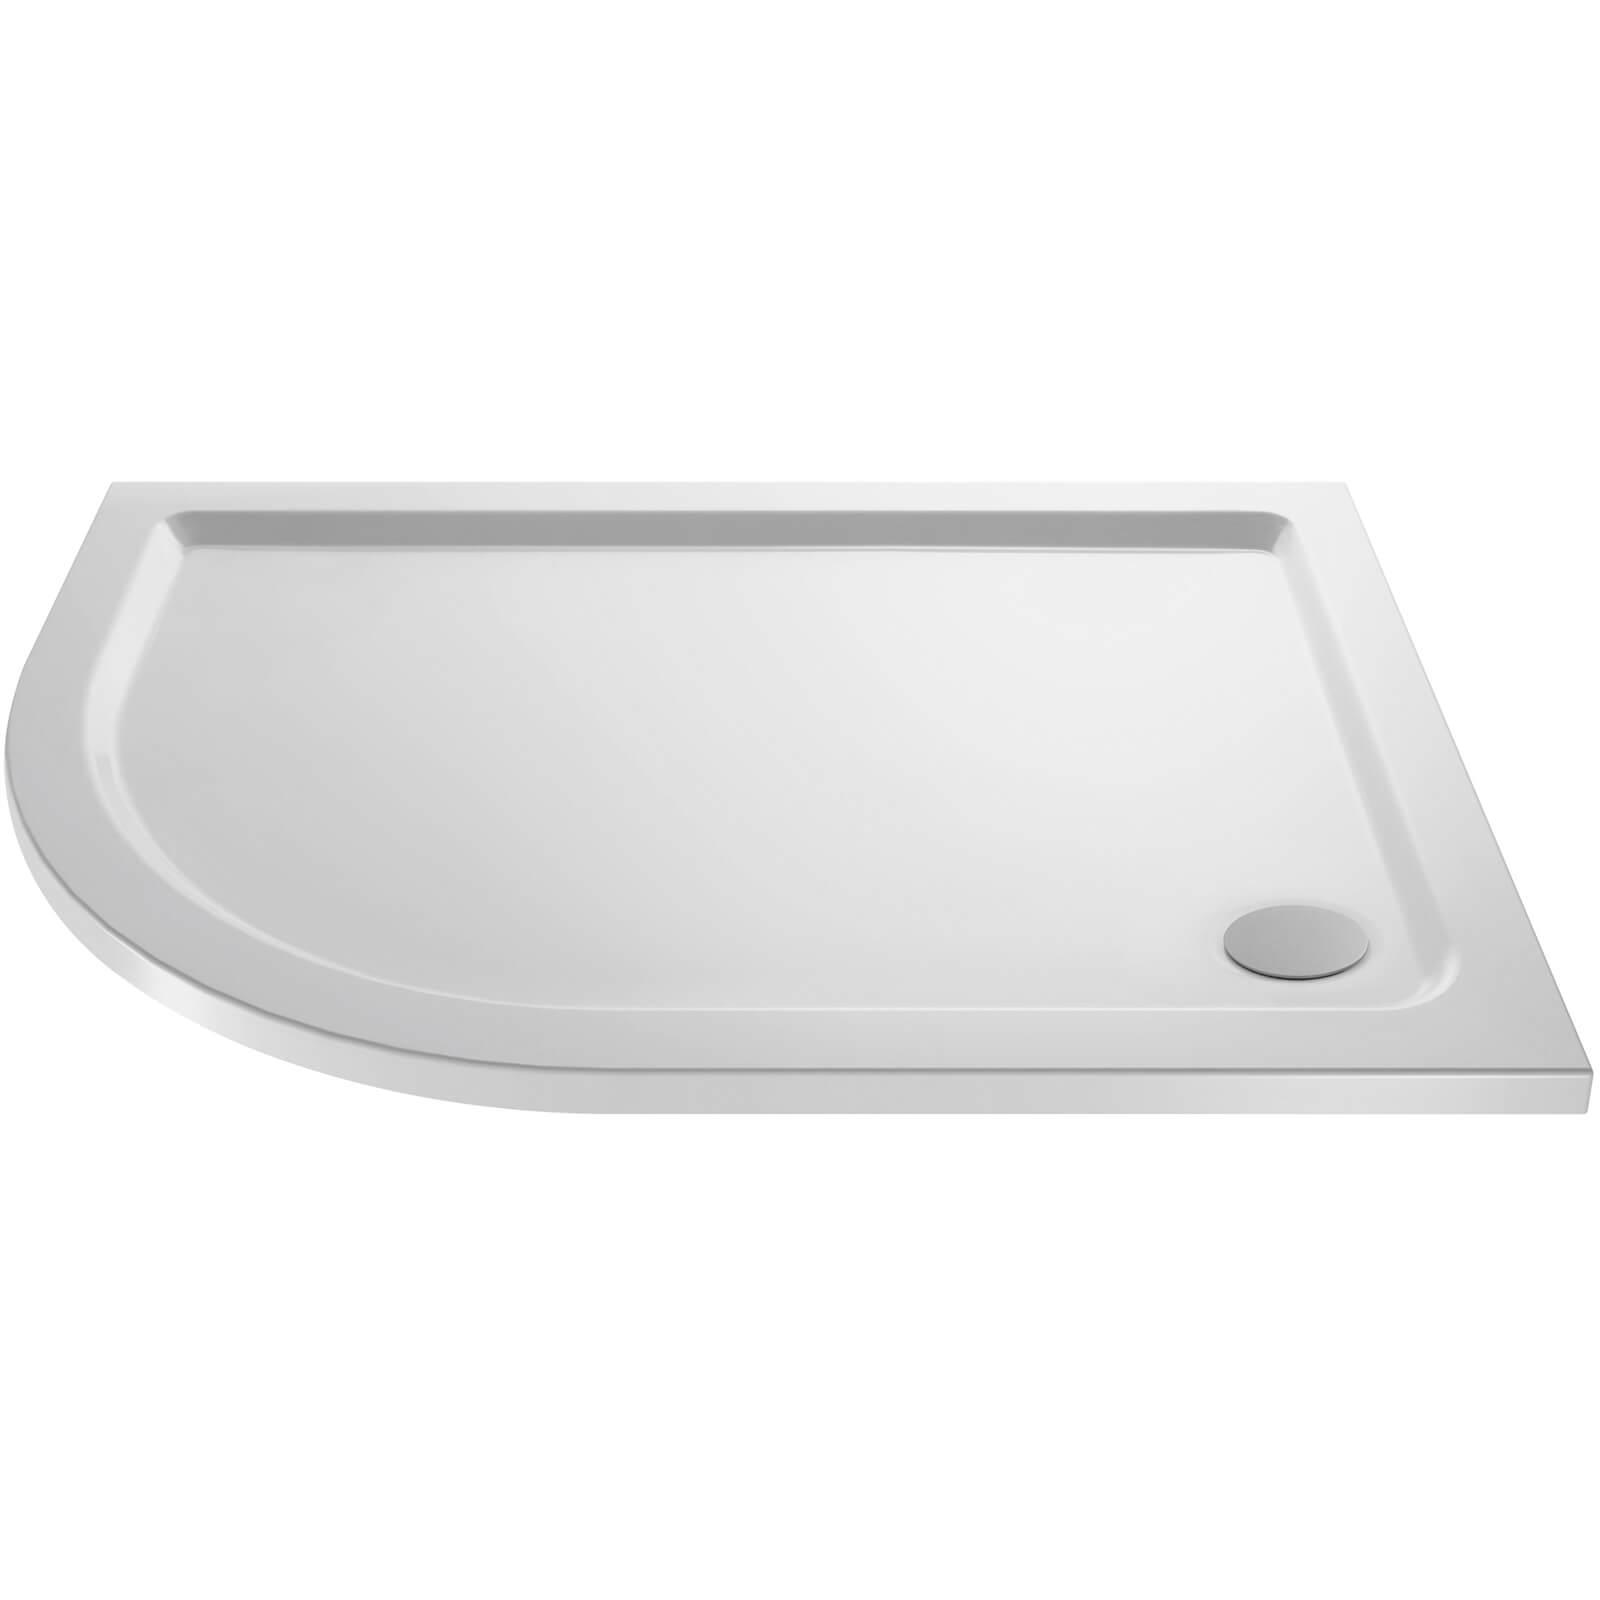 Balterley Left Hand Offset Quadrant Shower Tray - 1000 x 800mm